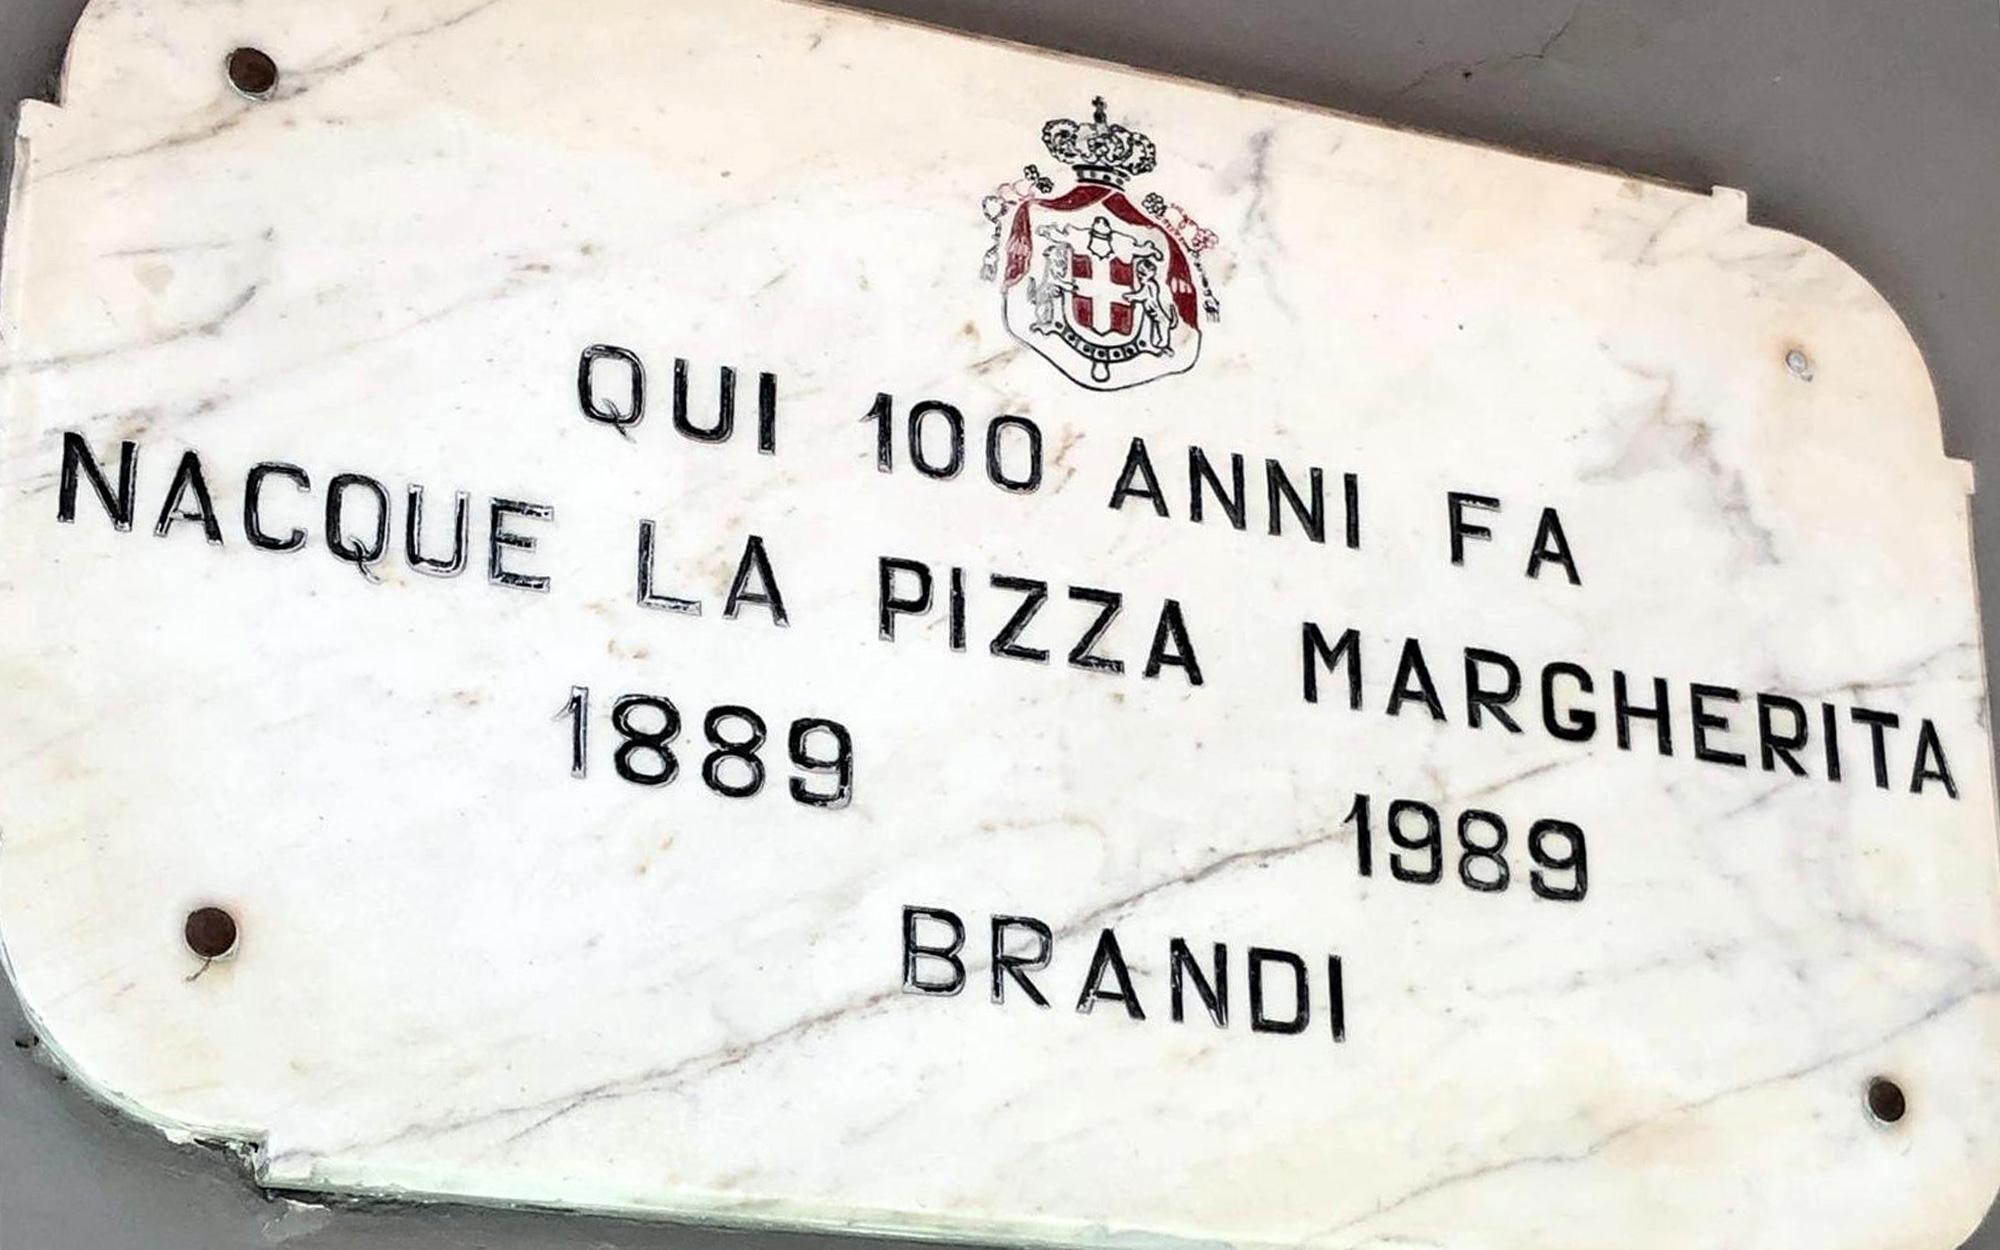 Marmorschild Pizzeria Brandi  (Foto: Uwe Krist)